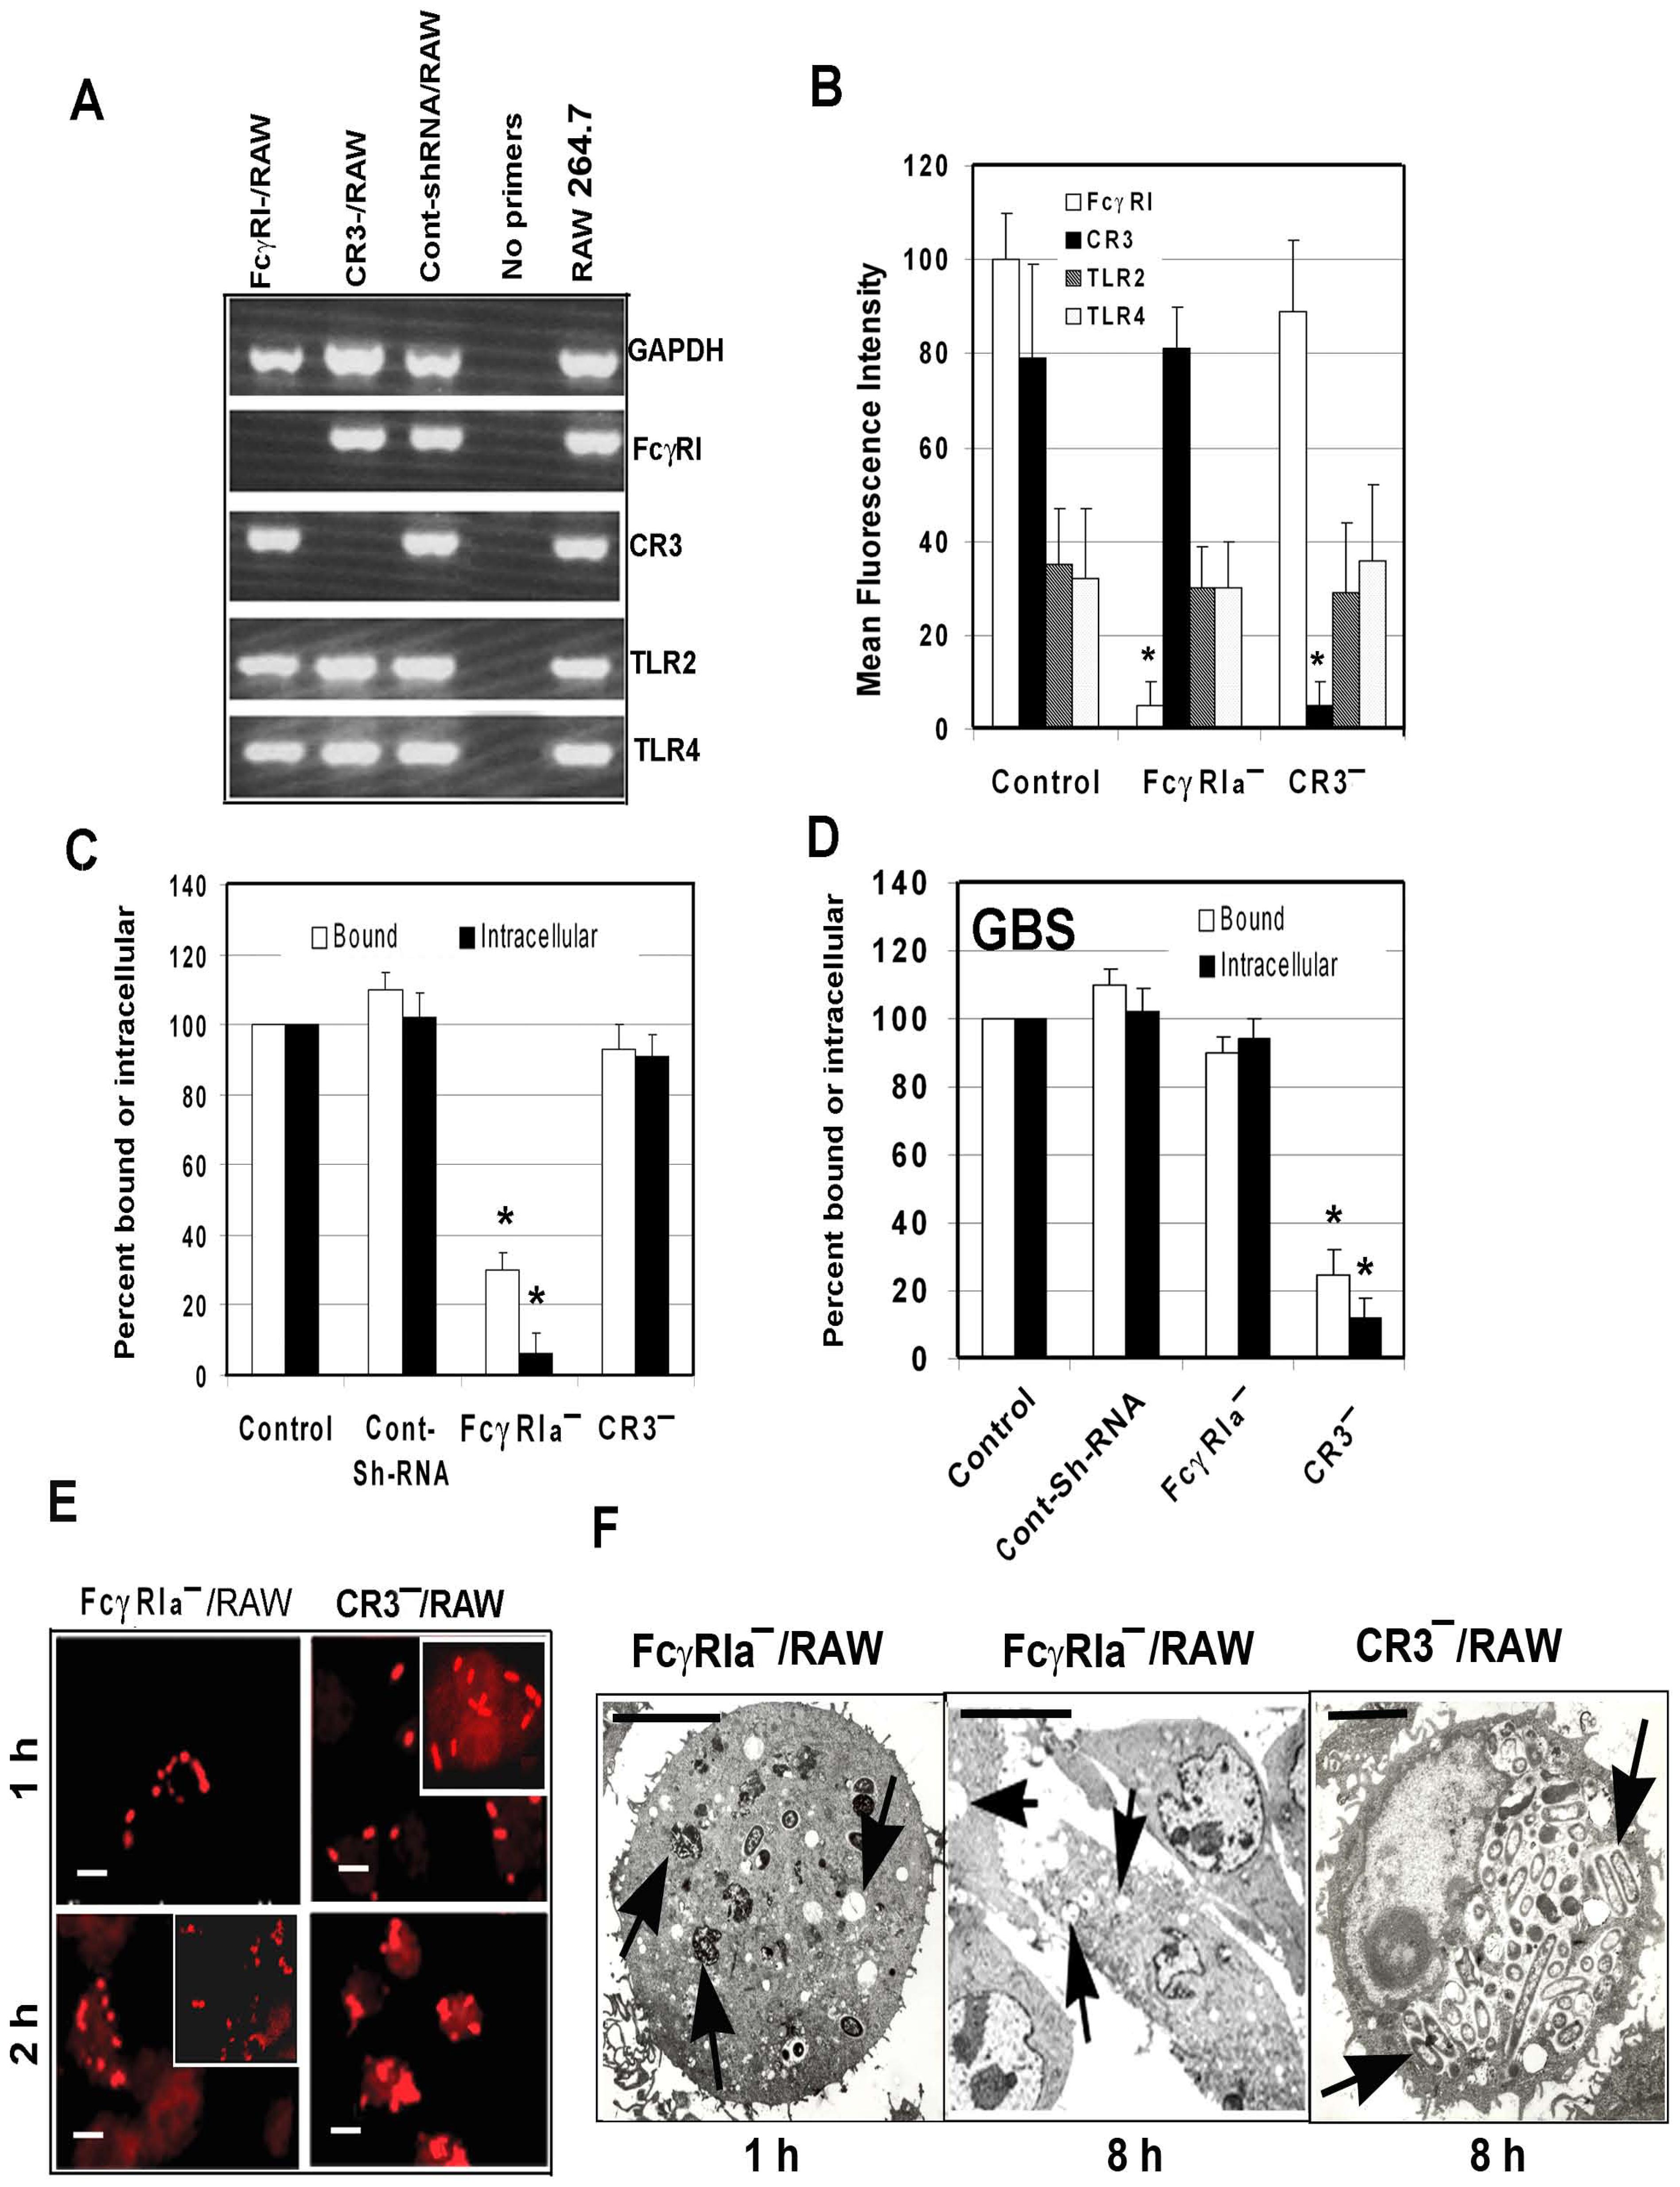 Suppression of FcγRIa expression using shRNA prevents <i>E. coli</i> K1 entry into RAW 264.7 cells.